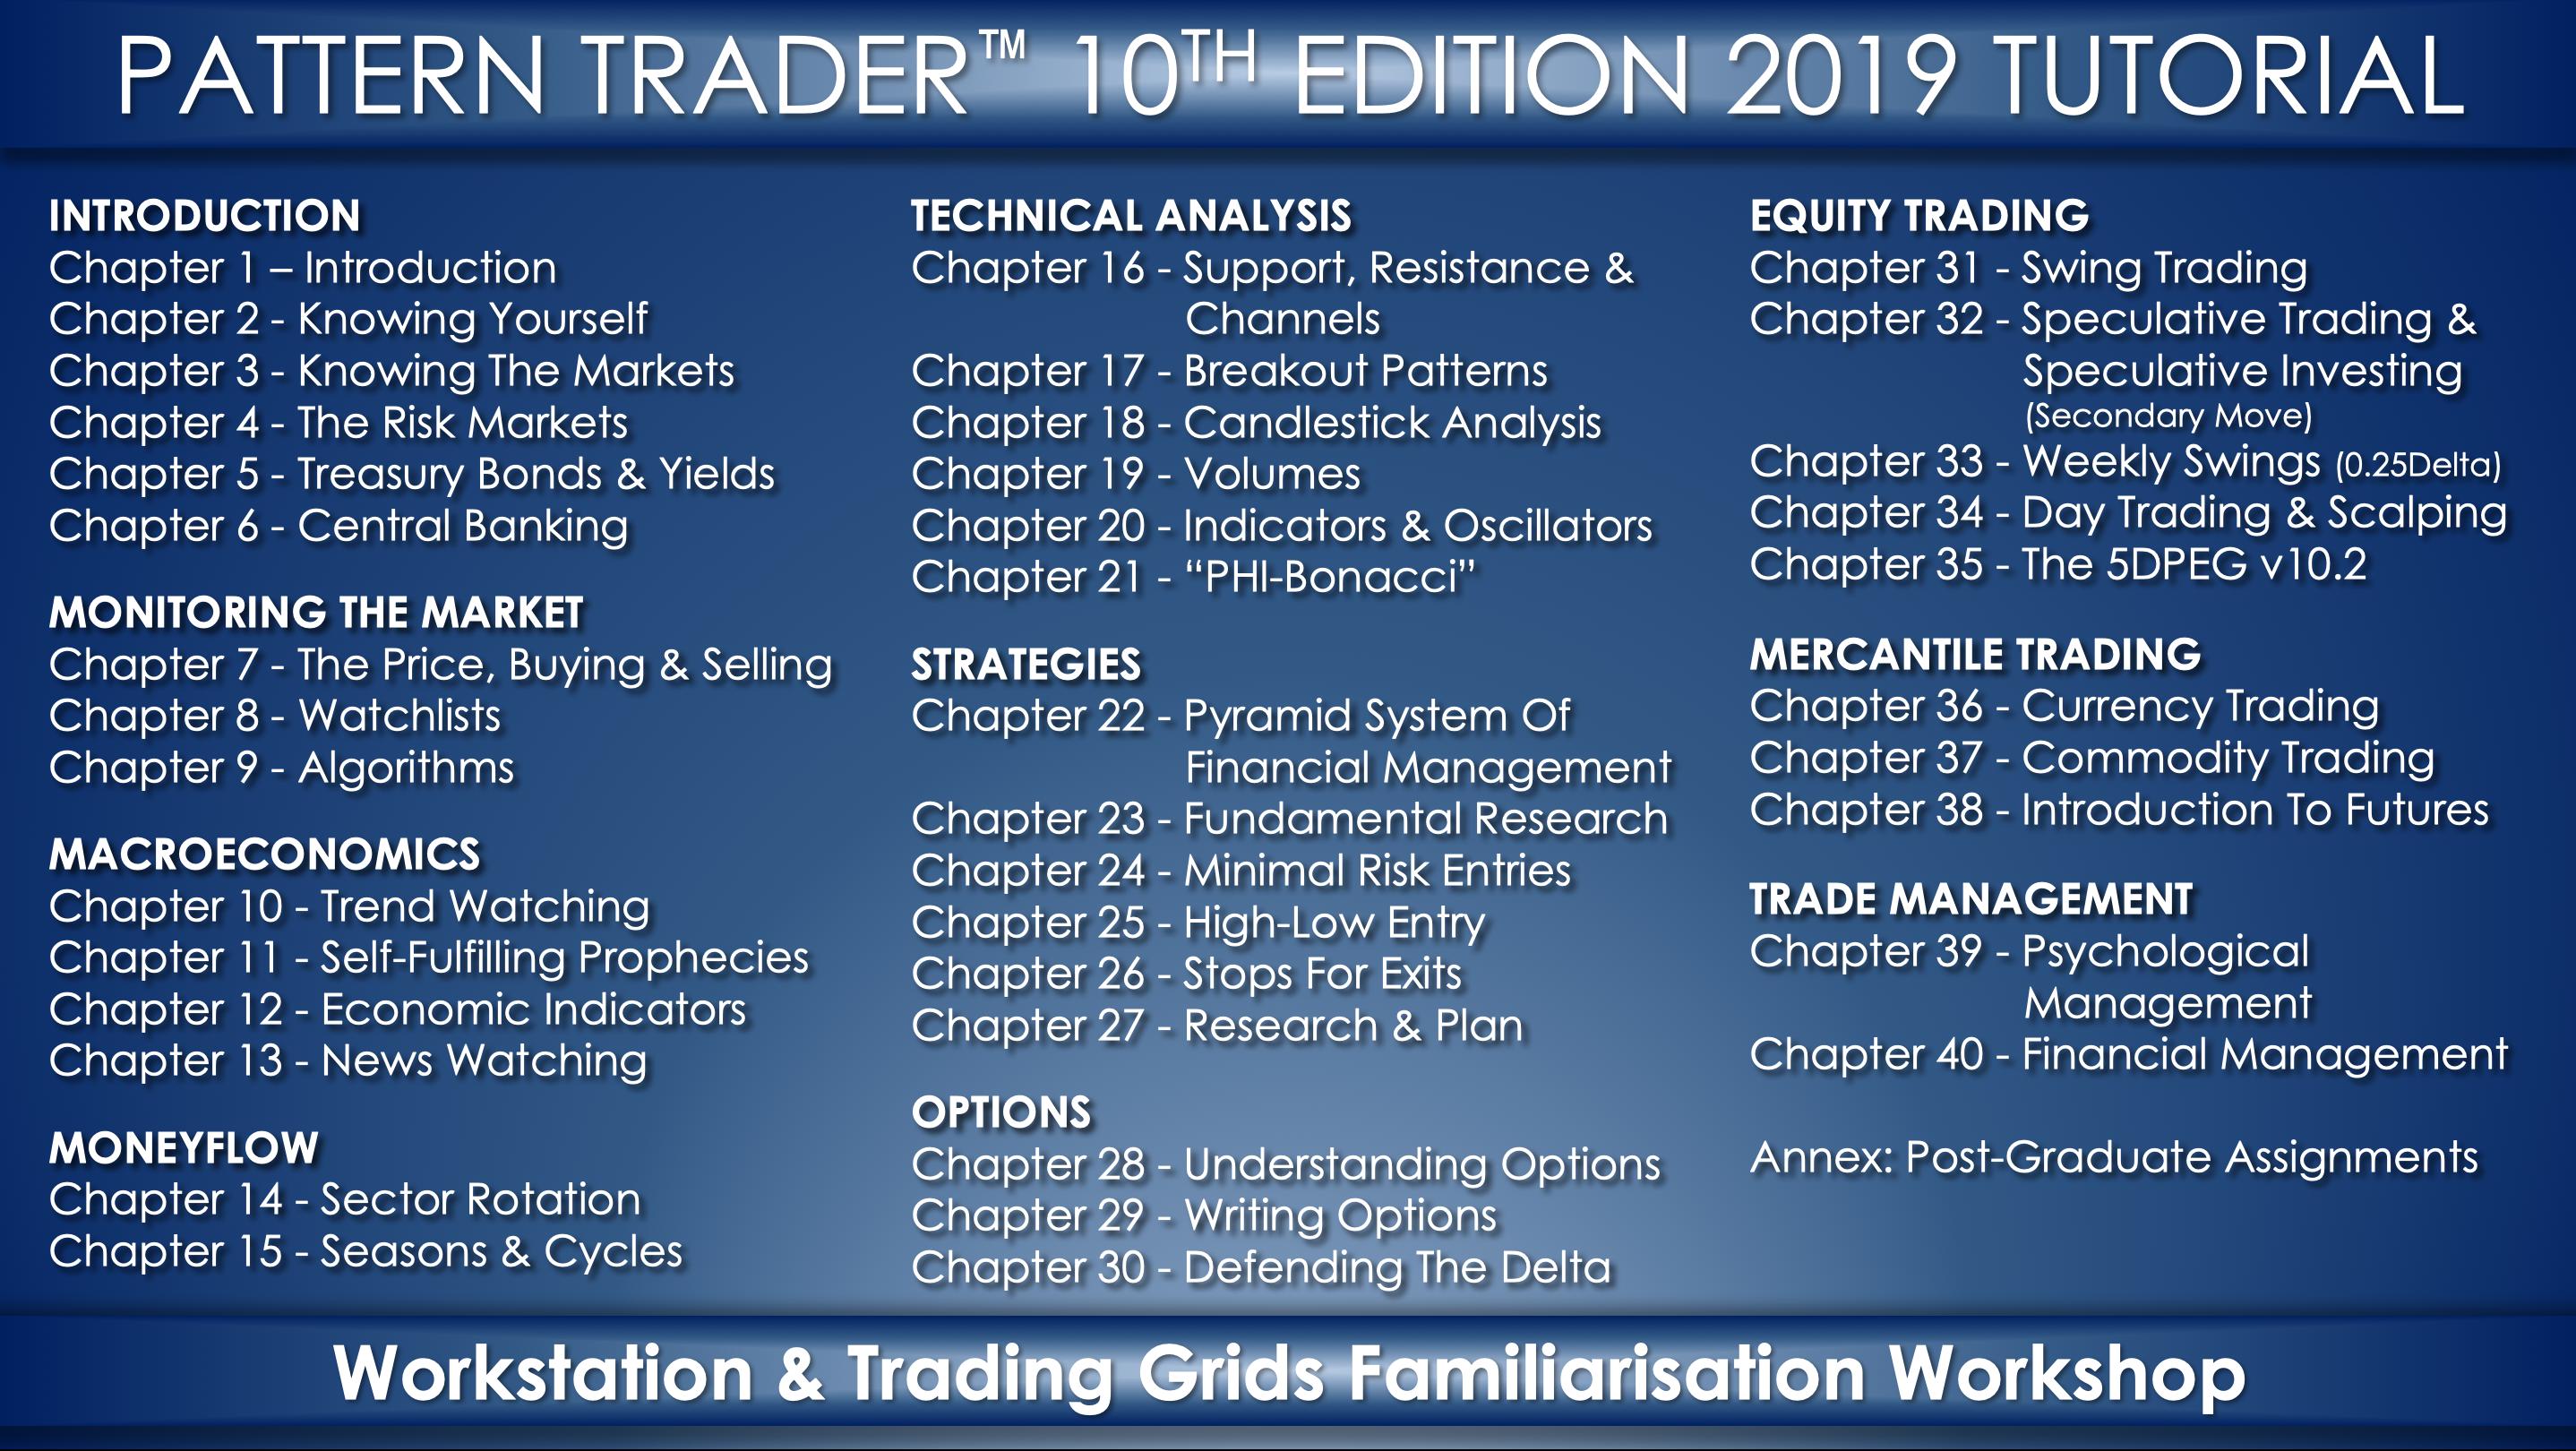 Pattern Trader Tutorial 10th Edition 2019 Syllabus